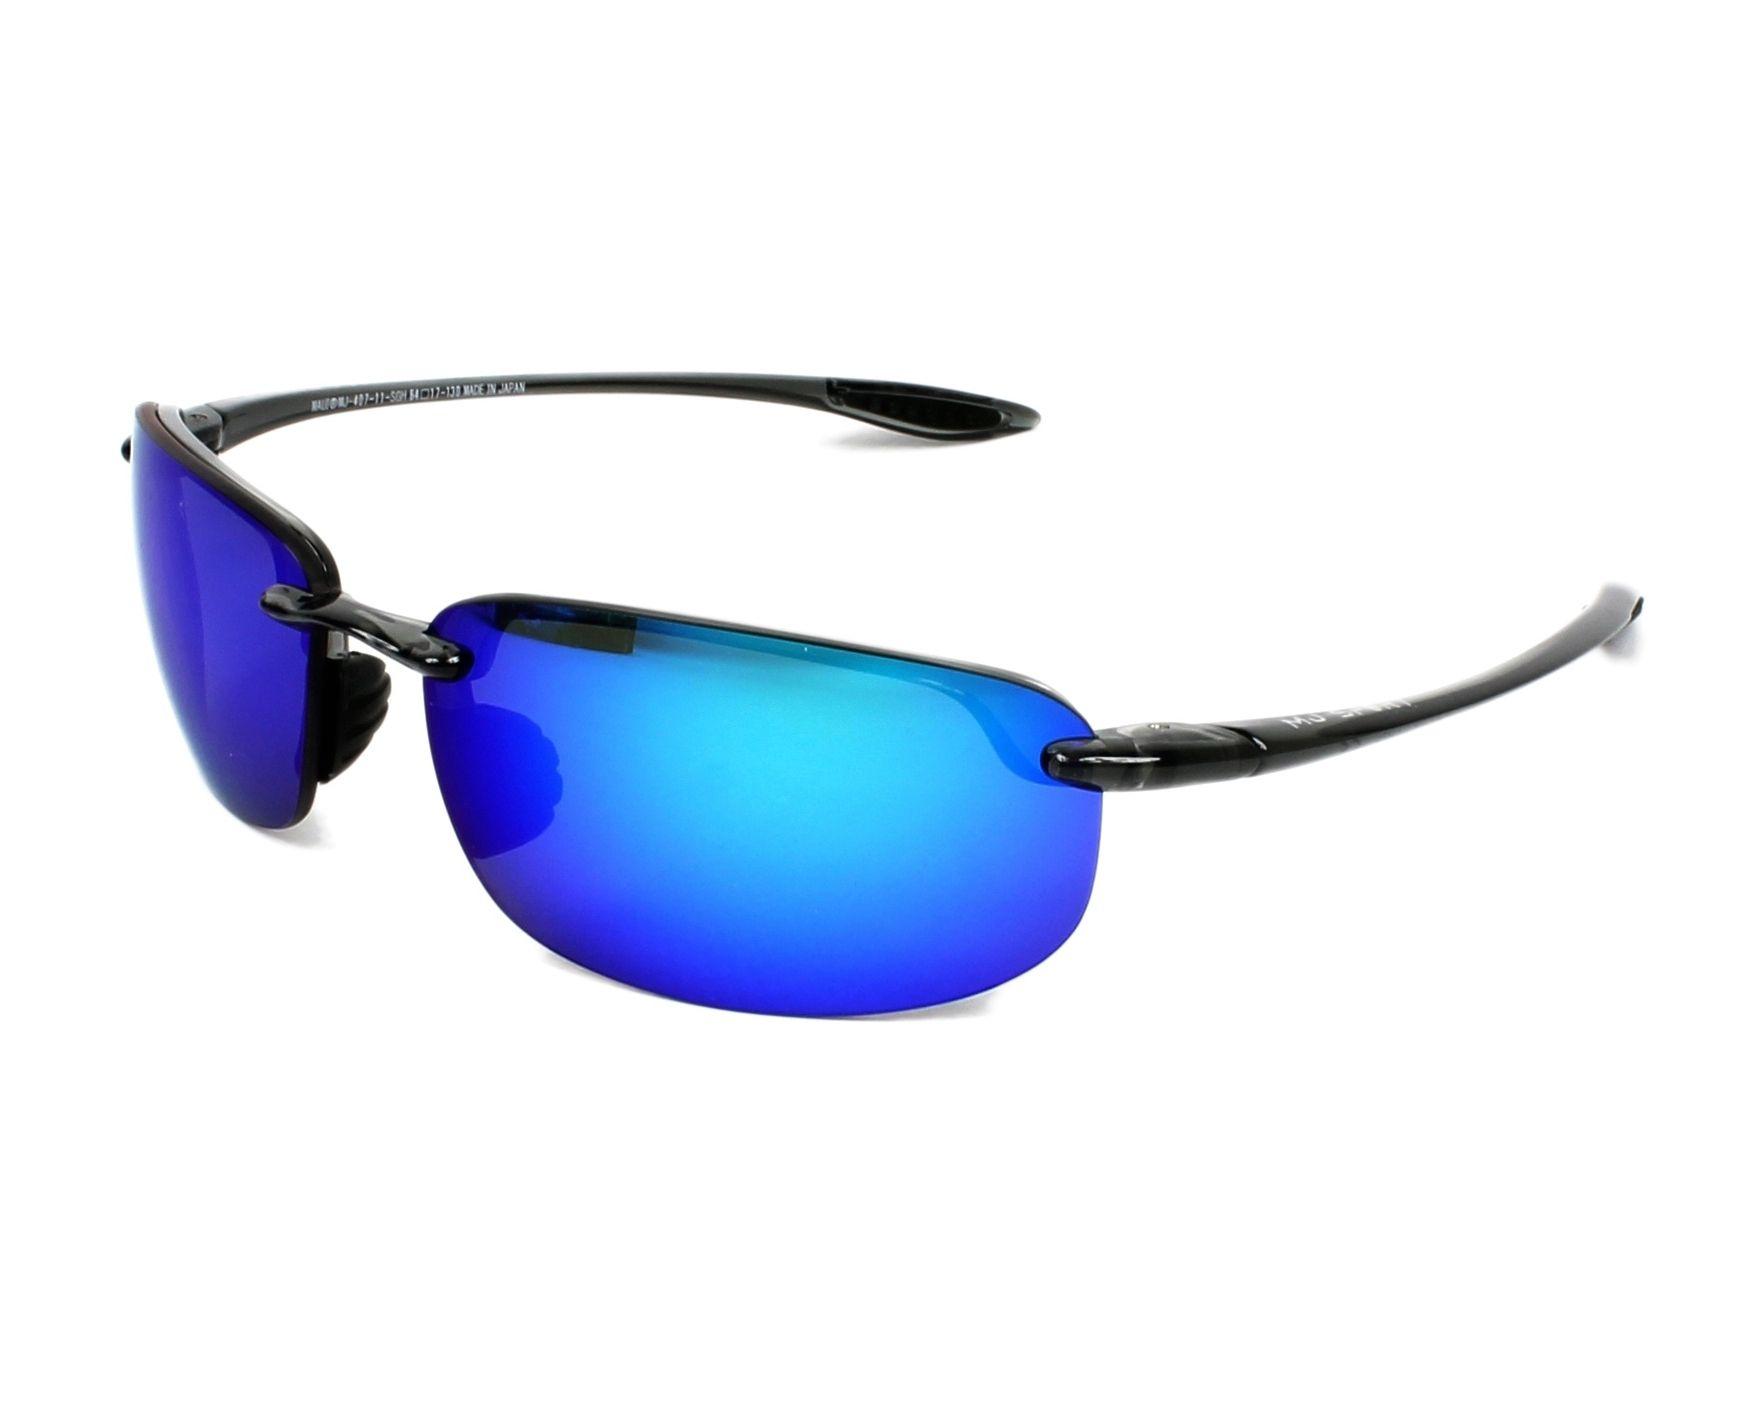 Maui Jim Sunglasses Hookipa B 407 11